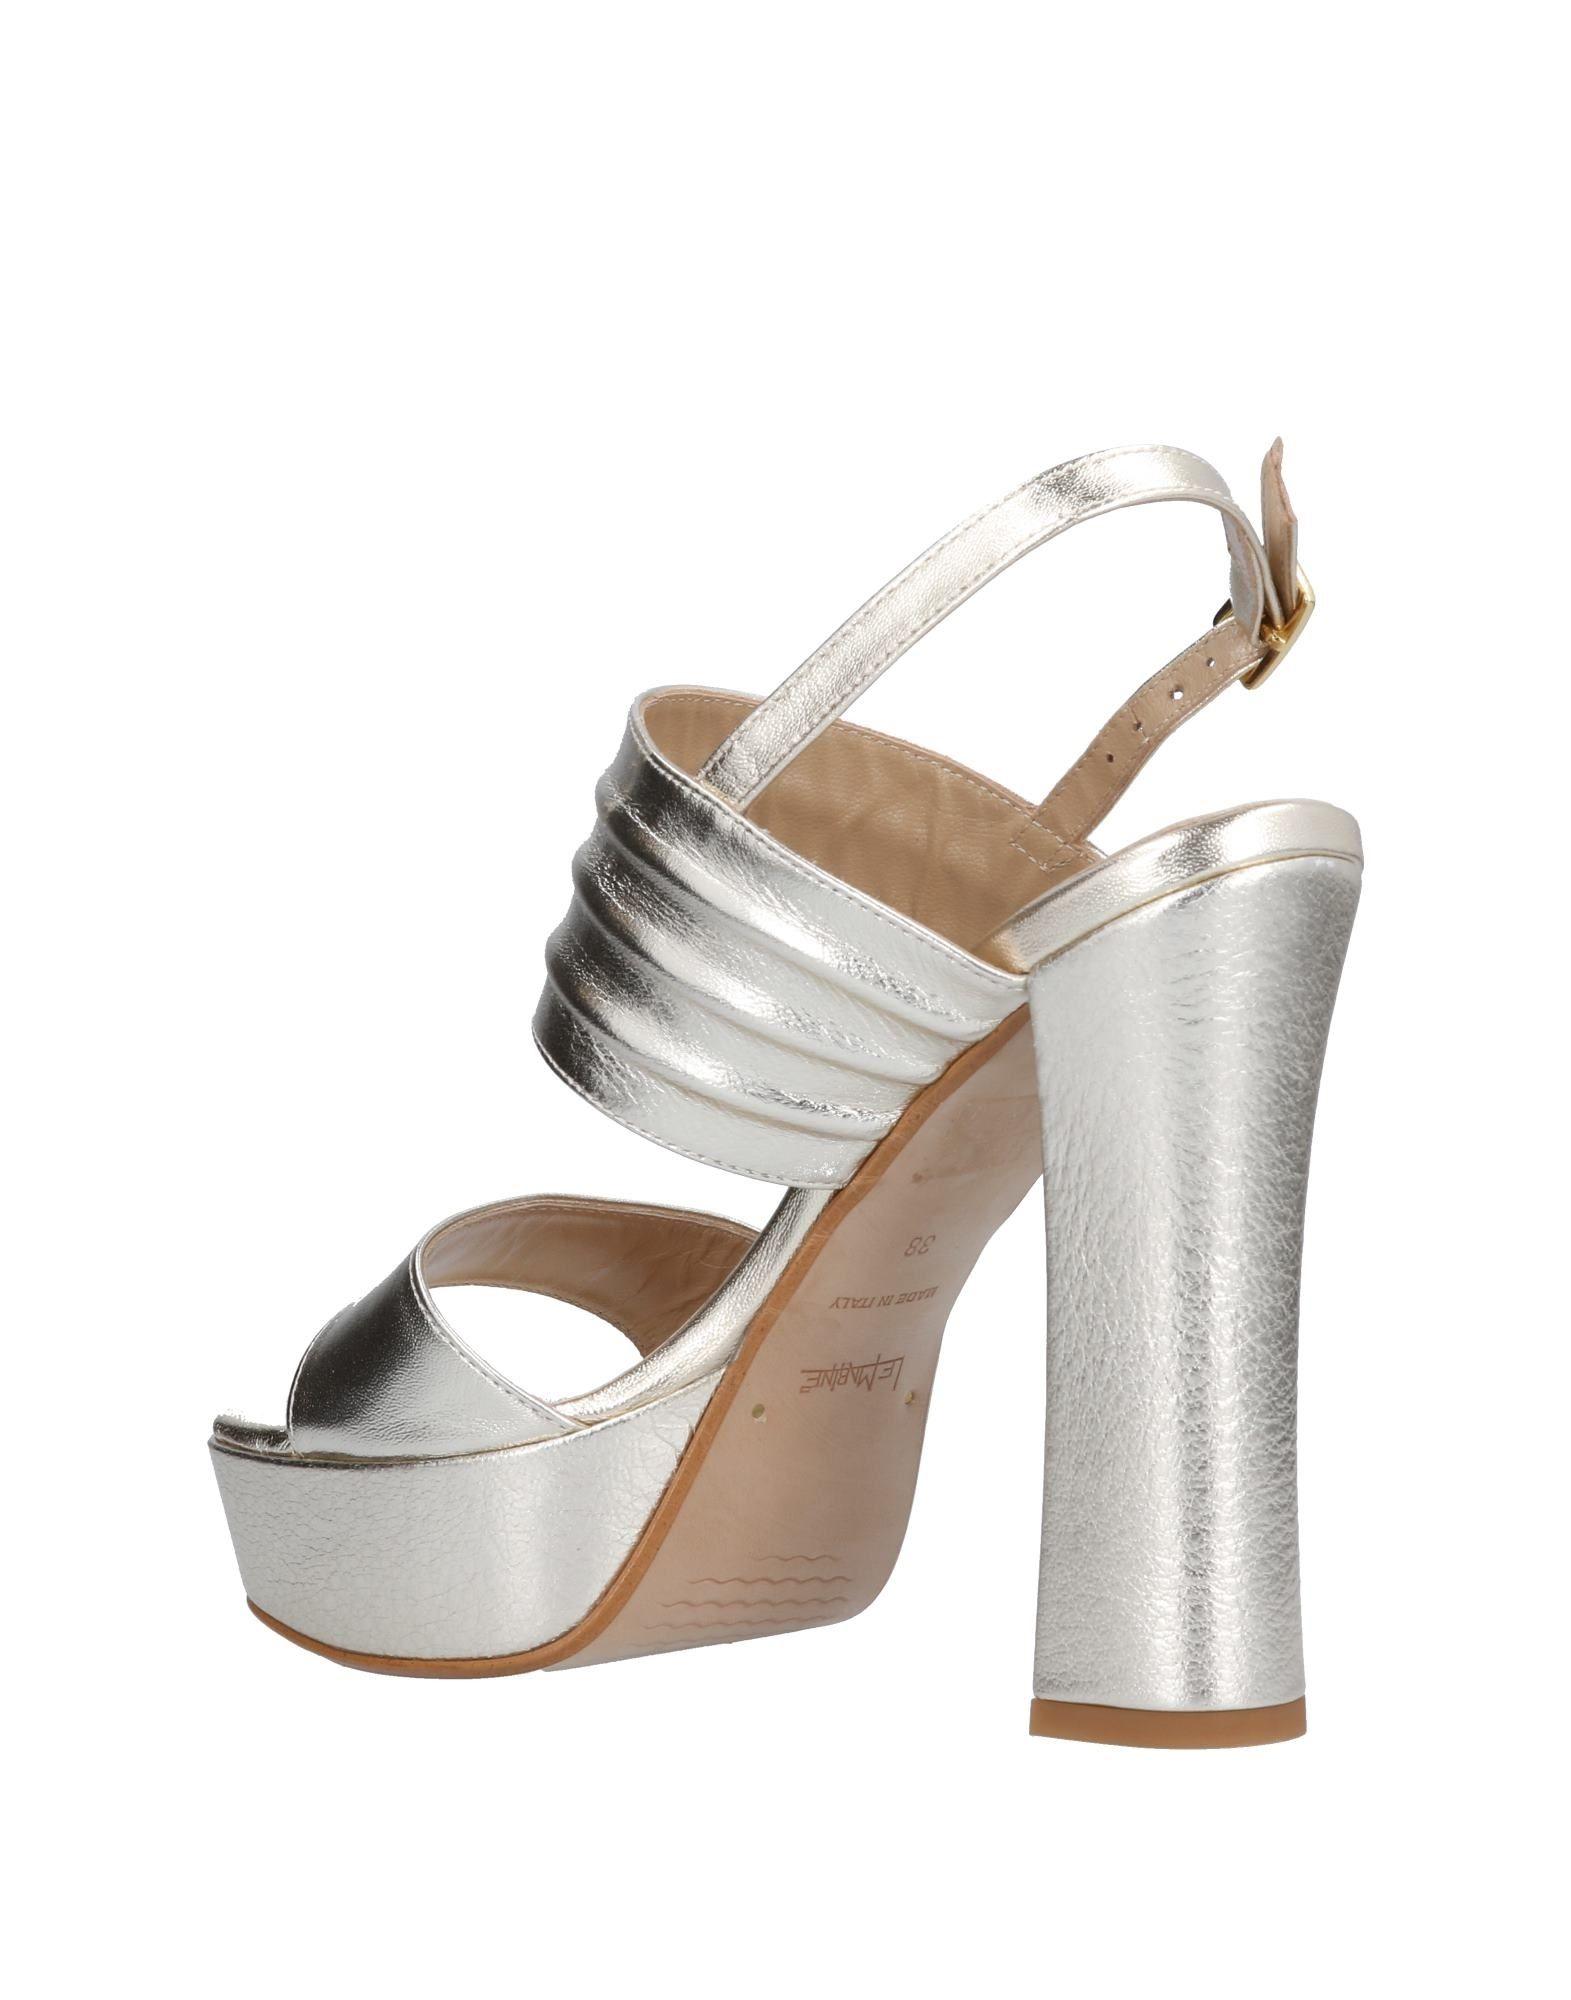 Le 11500107OF Marinē Sandalen Damen  11500107OF Le Neue Schuhe 8f419e